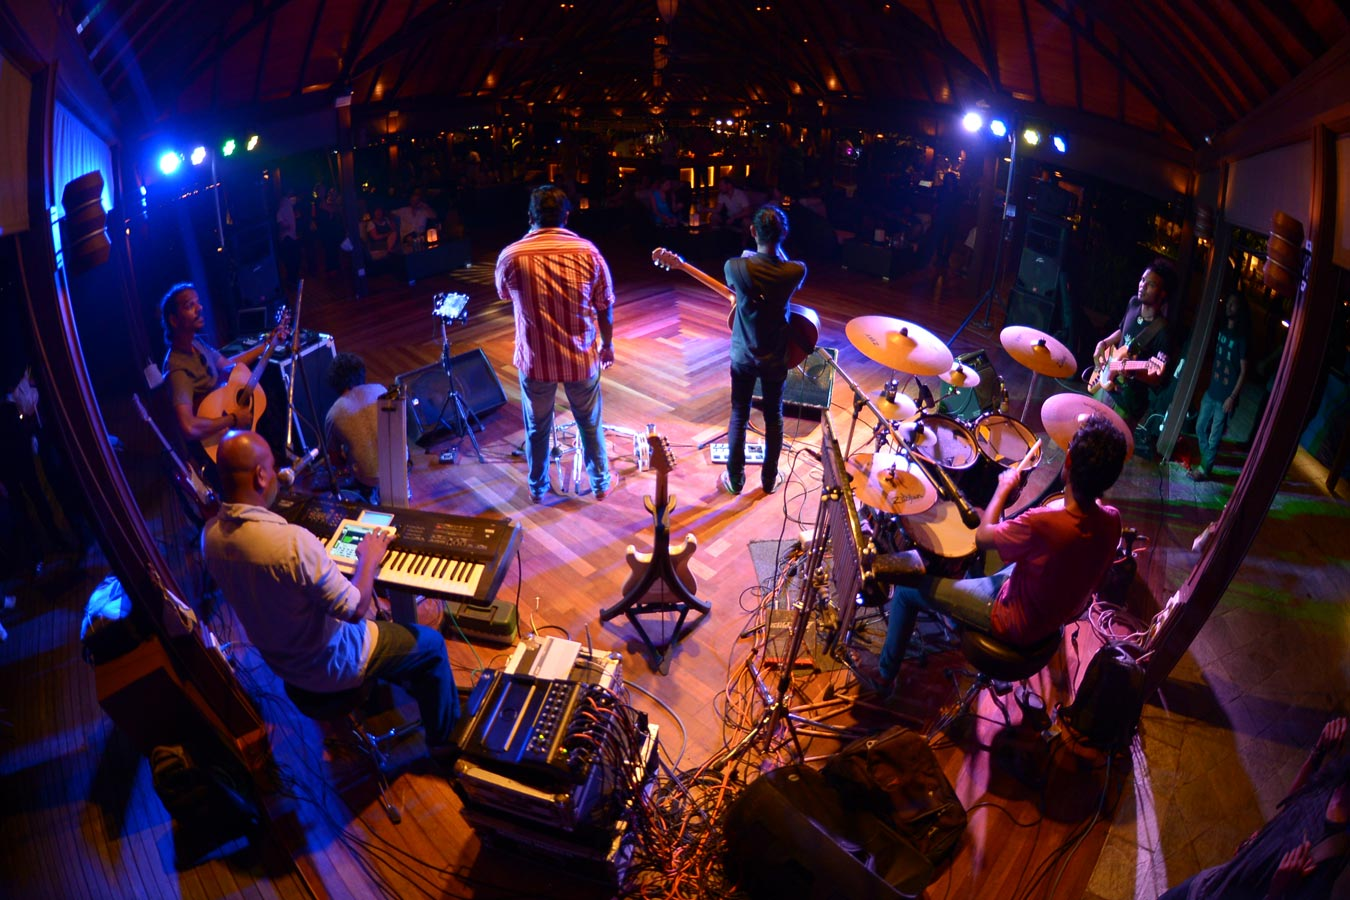 Kurumba Maldives Event Calendar Live Band Party Image | Maldives Resorts